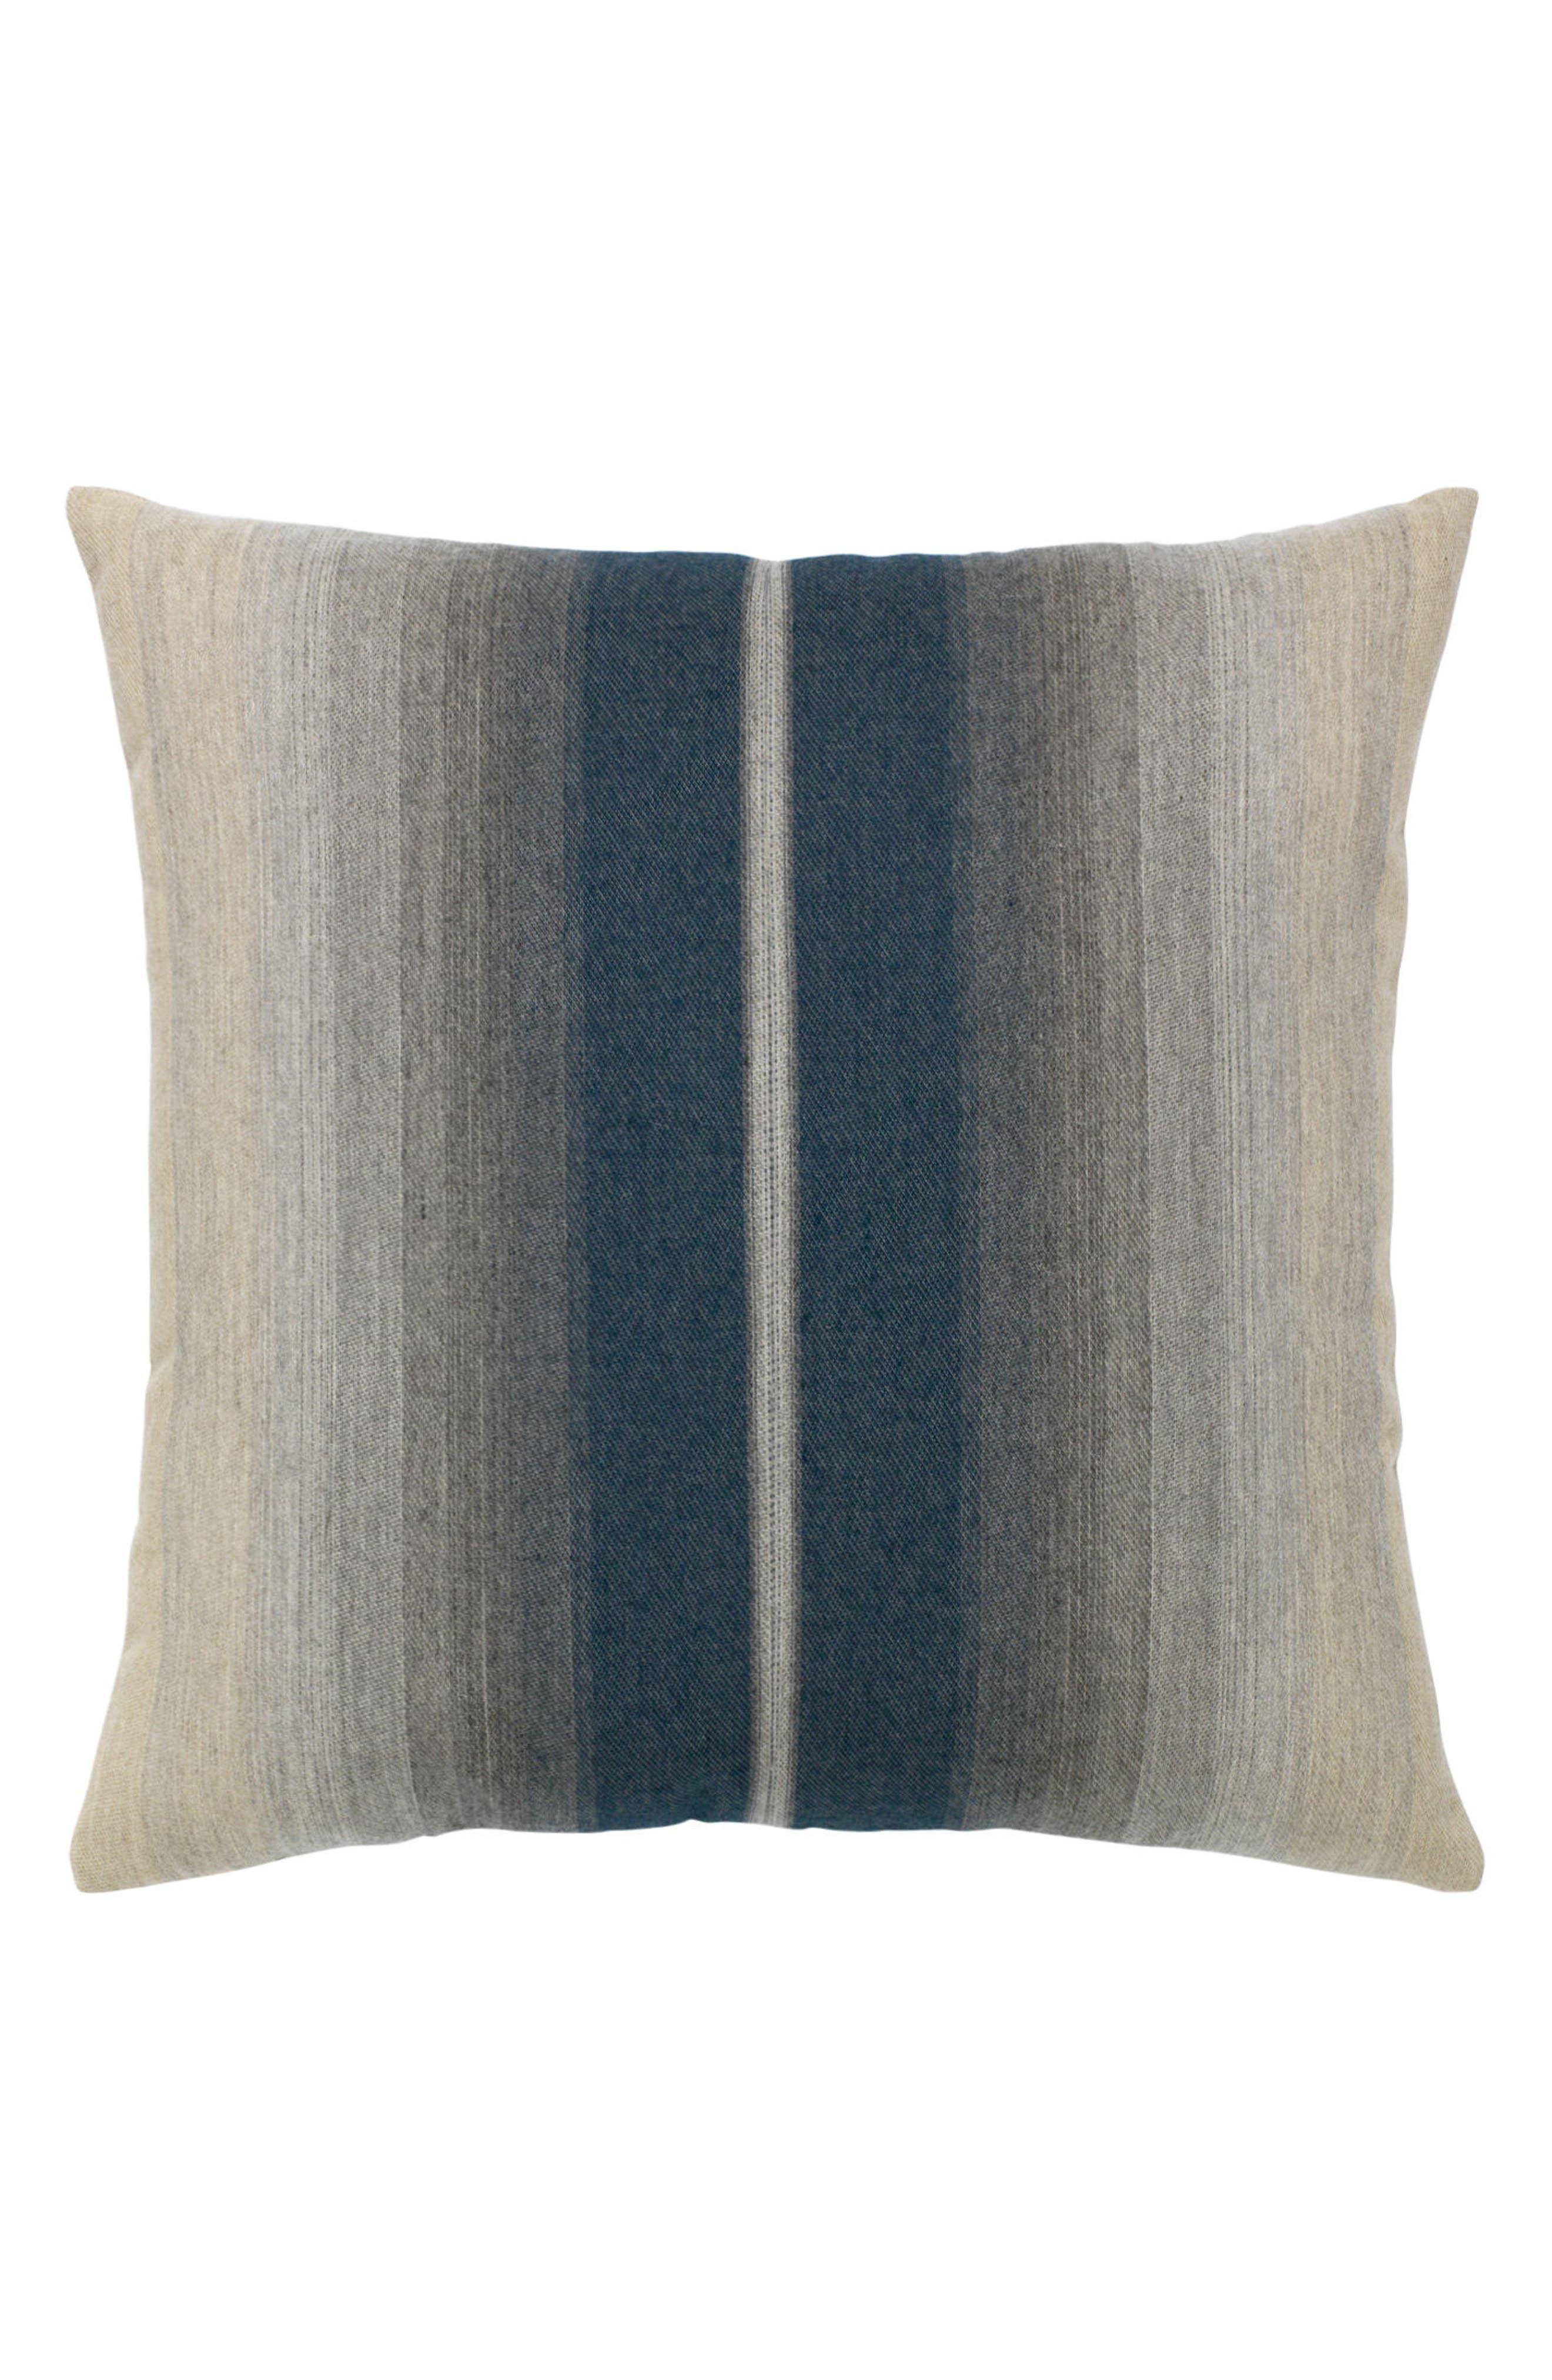 Ombré Indigo Indoor/Outdoor Accent Pillow,                         Main,                         color, 400